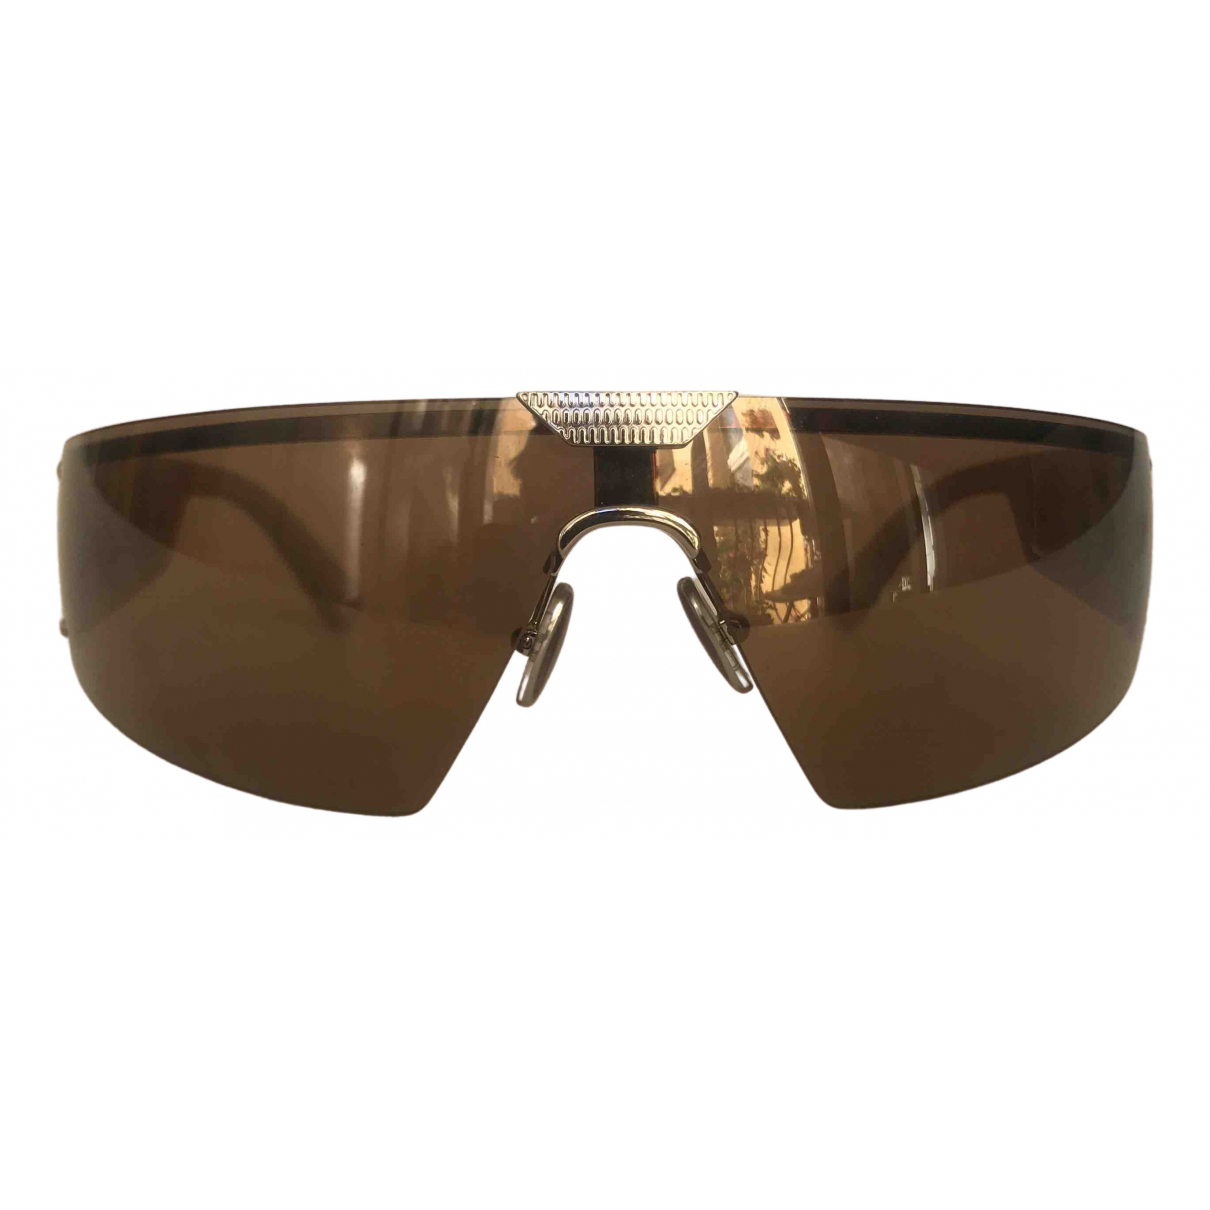 Roberto Cavalli \N Metallic Sunglasses for Women \N